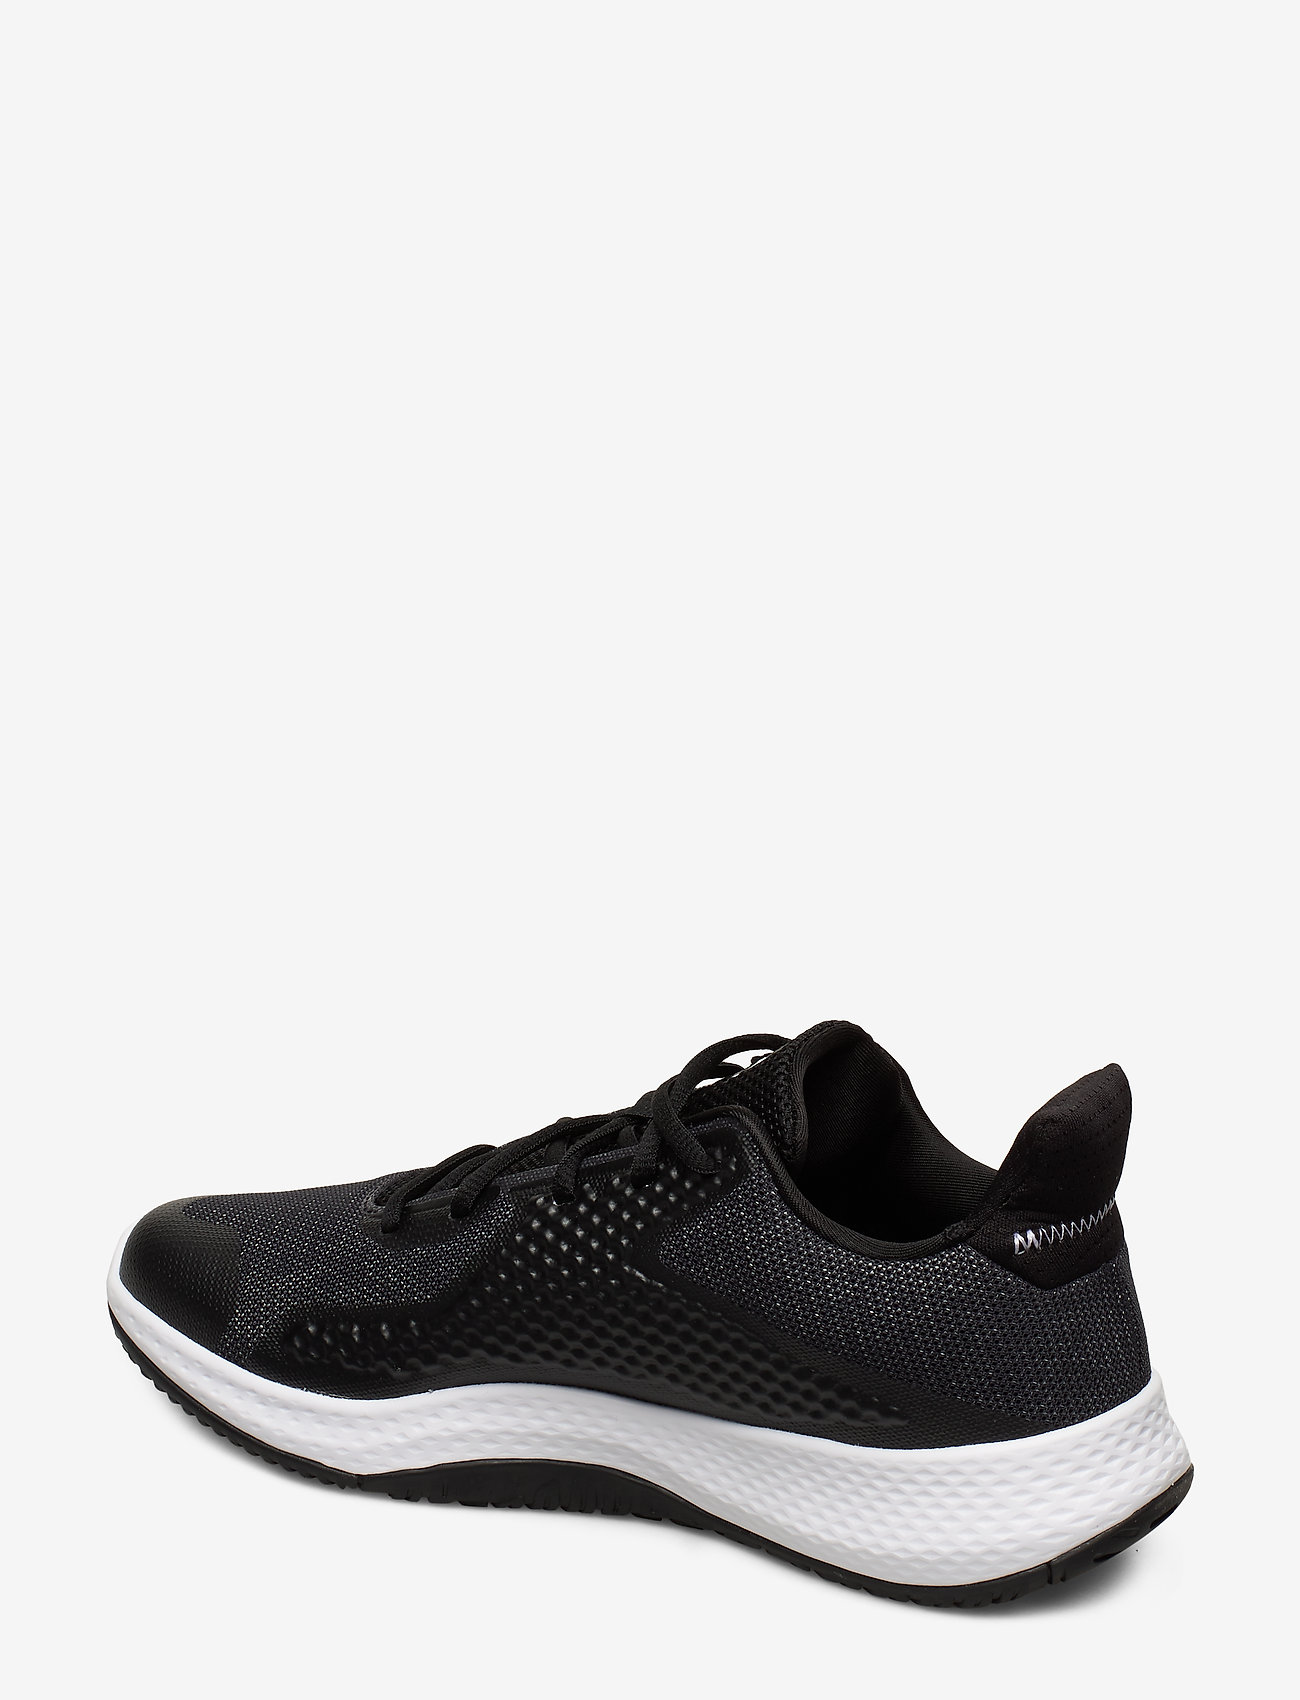 Fitbounce Trainer M (Cblack/ftwwht/cblack) - adidas Performance